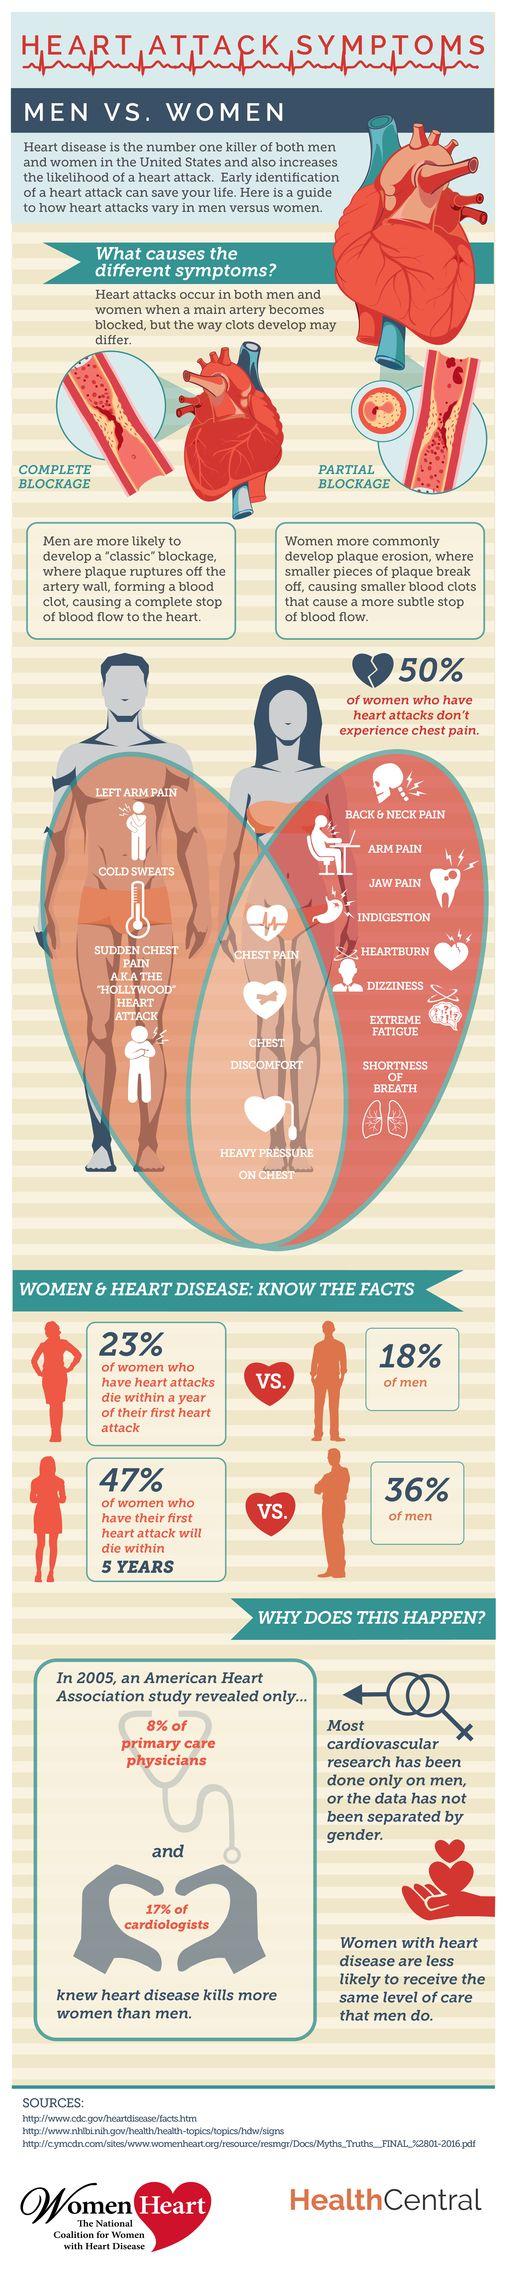 Heart Attack Symptoms: Men vs. Women - Heart Attack - Heart Disease